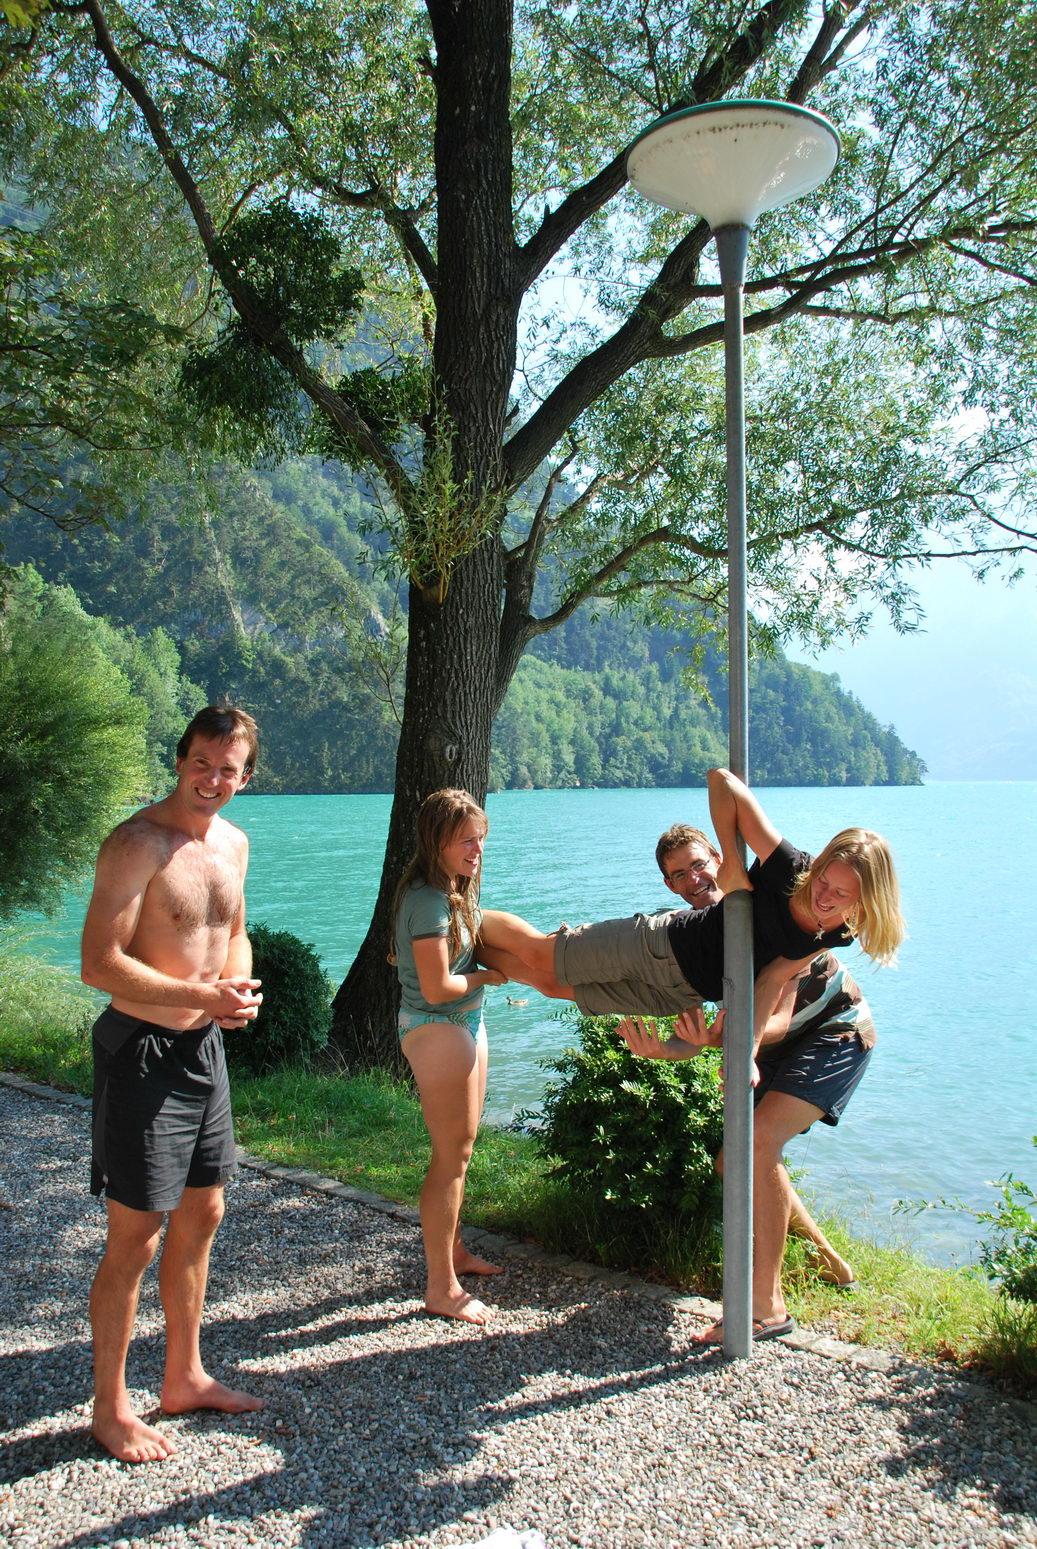 pole-dancing-with-abbie-2-swiss-o-week-switzerland